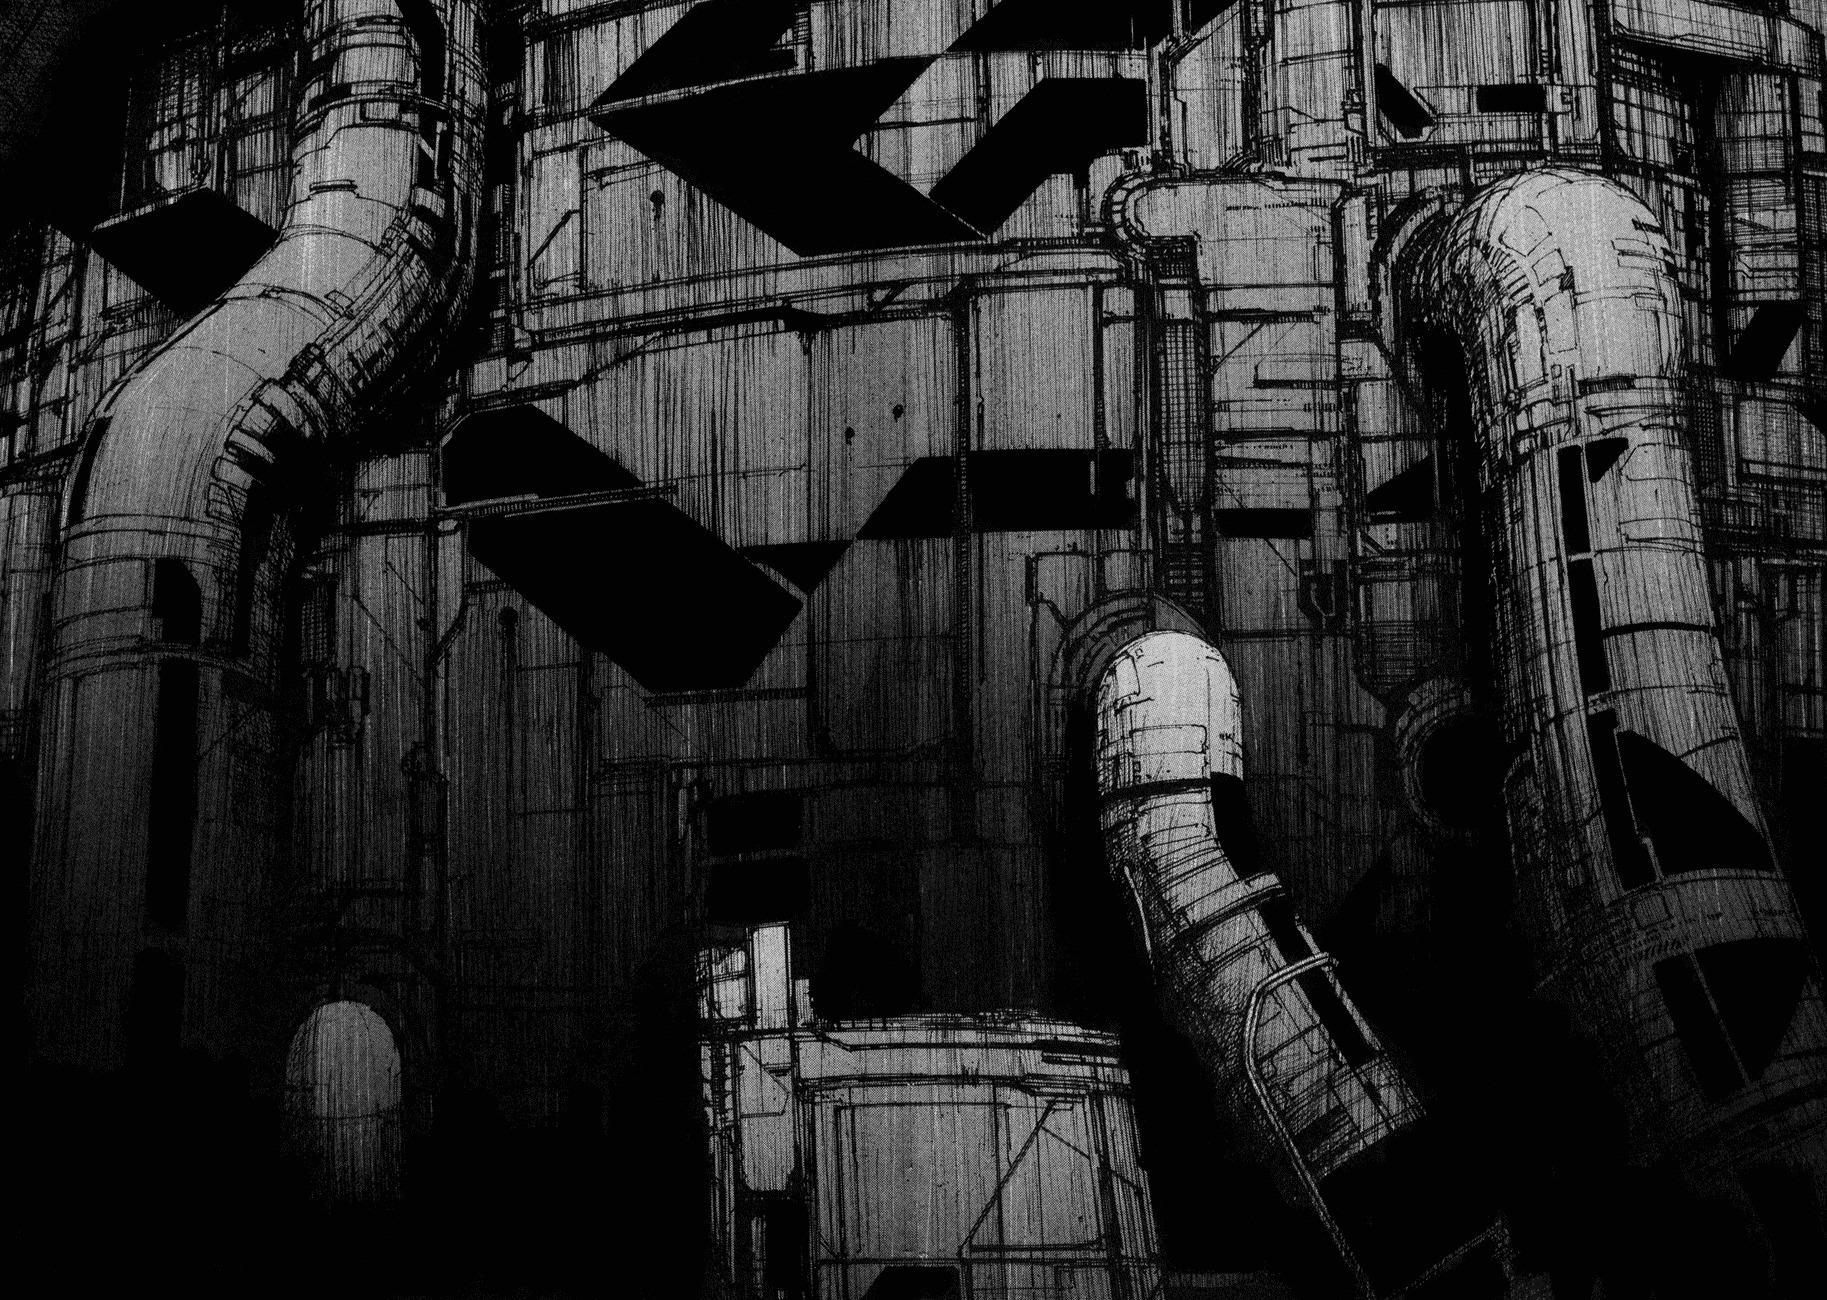 Machine Sci Fi wallpapers HD quality